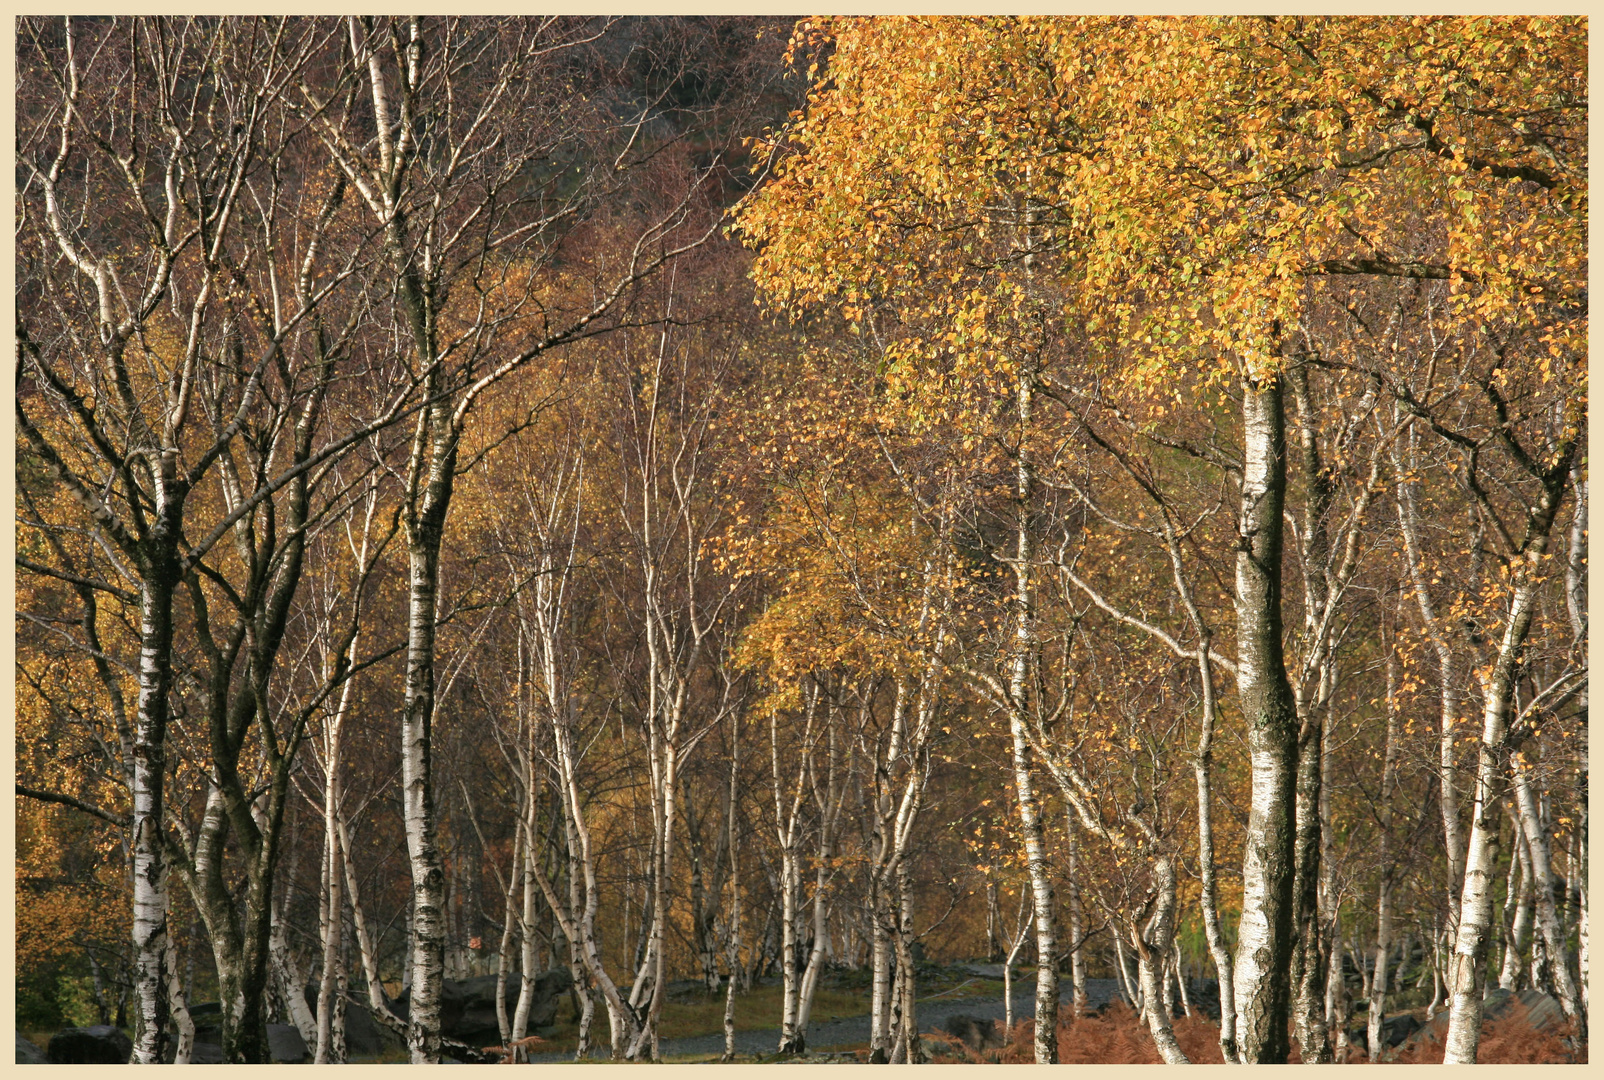 Birch trees colonising tilberthwaite quarry 6